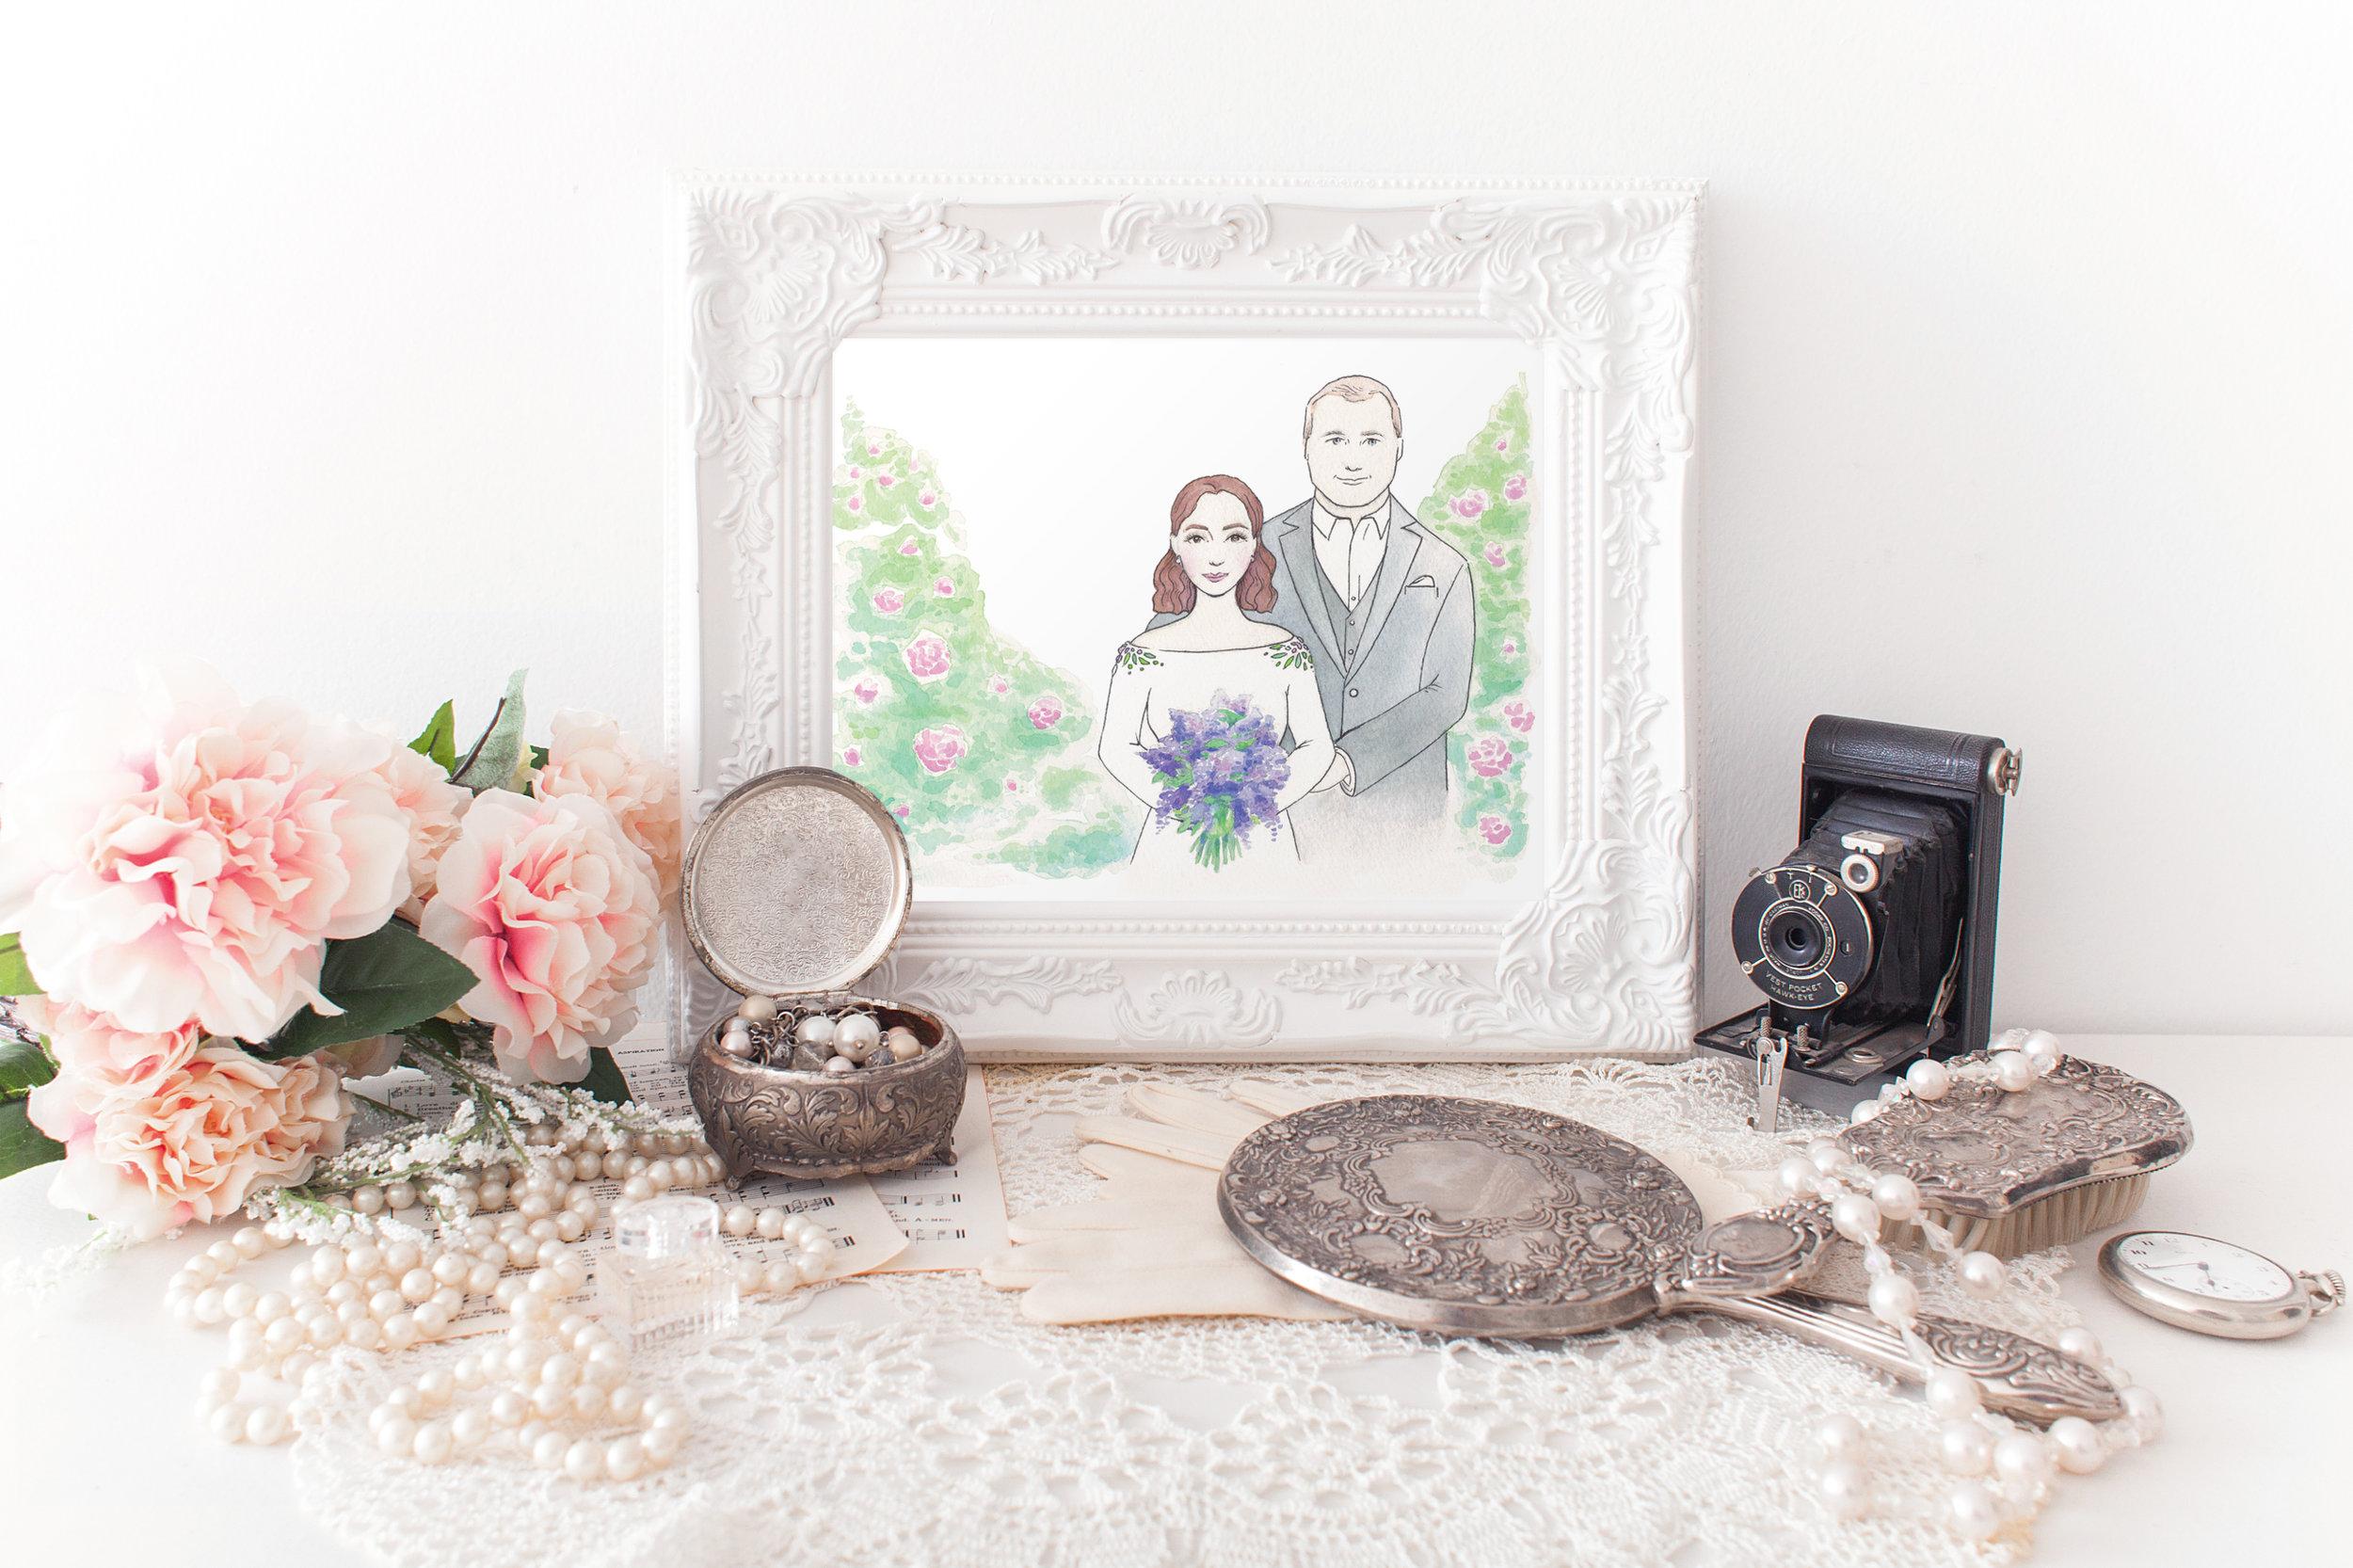 Botanical-Garden-Wedding-Art-Vintage-Couples-Portrait-Watercolor-Luminous-Creative-Studio.jpg